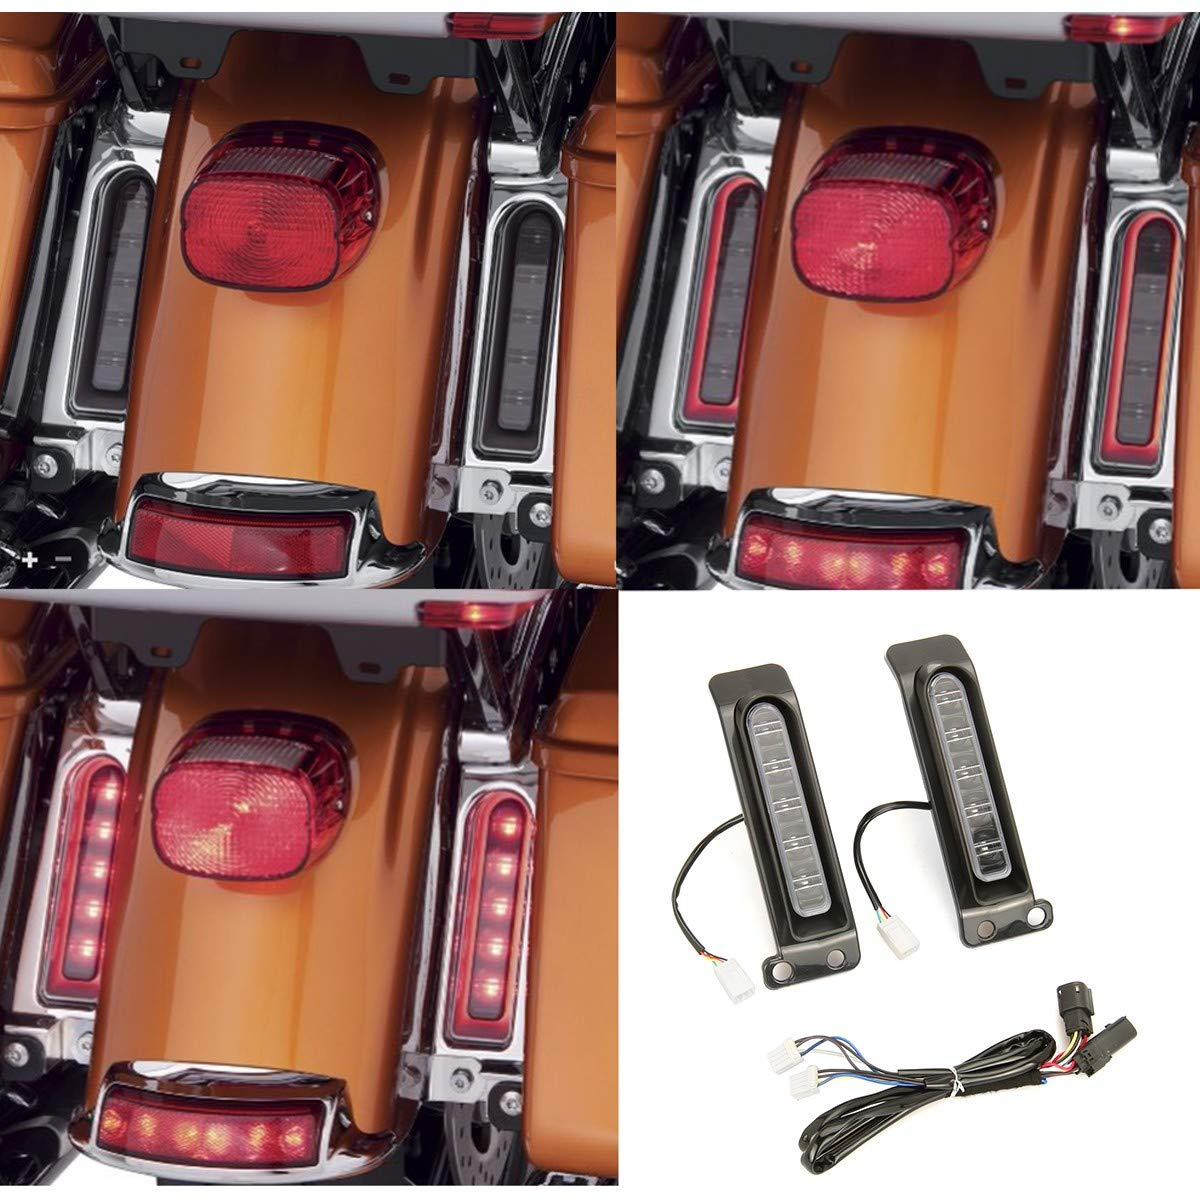 Electra Glo Keystone LED ausiliario Run//Brake Turn Lampade per harley FLHTCU parafango posteriore FLHTK Keystone side bag laterale FLTRU 14-18